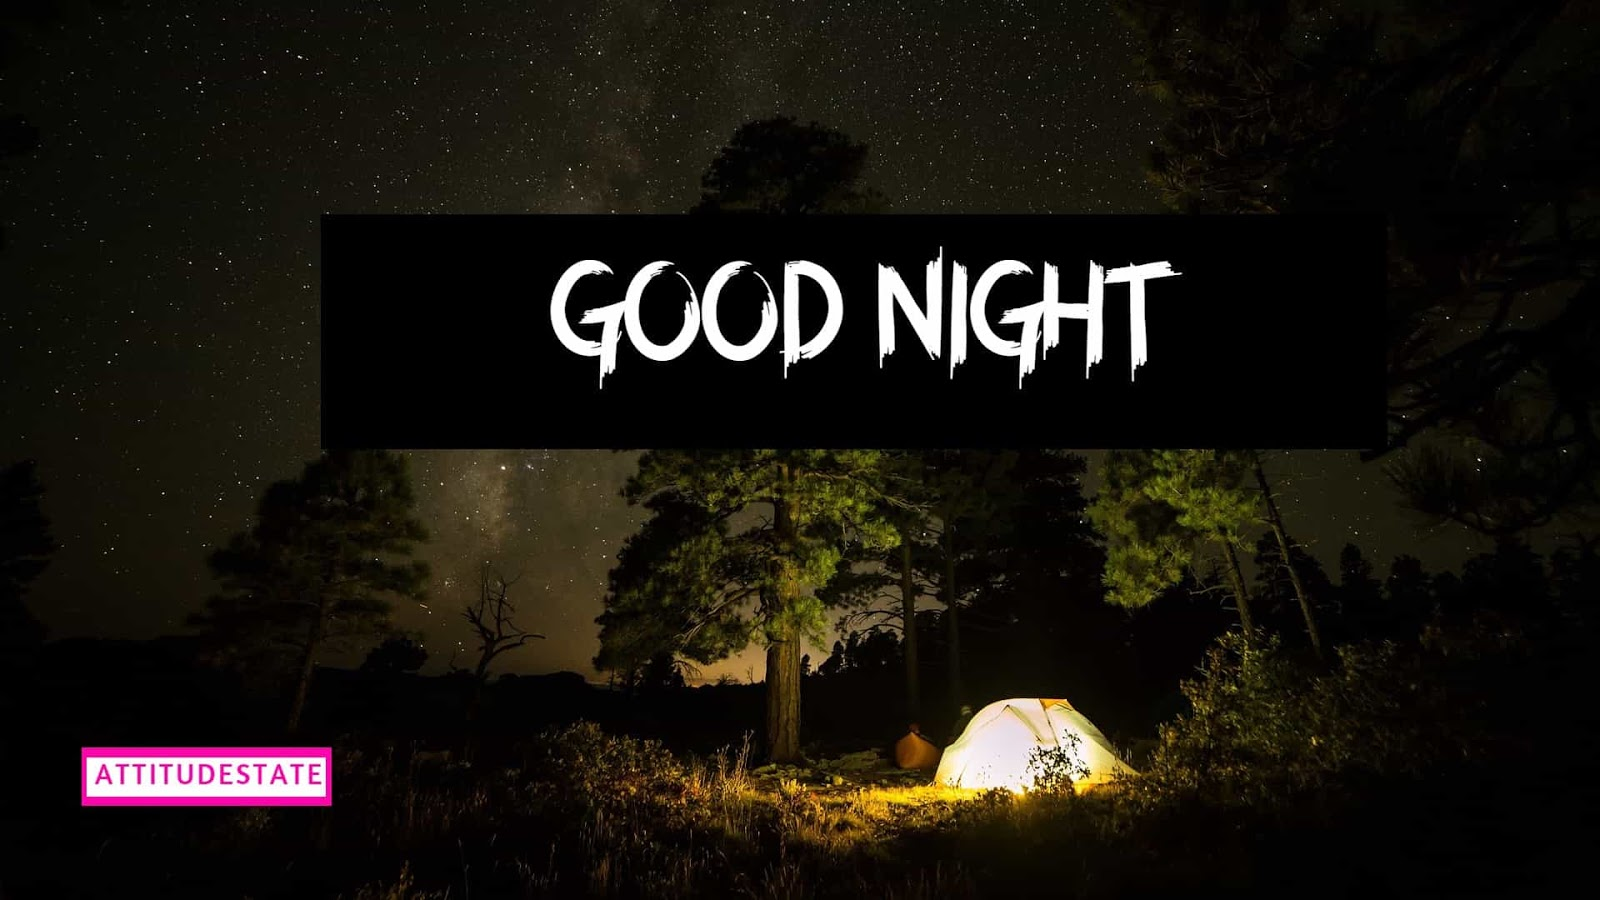 125 Hd Photos Good Night Goodnight Image Good Night Image